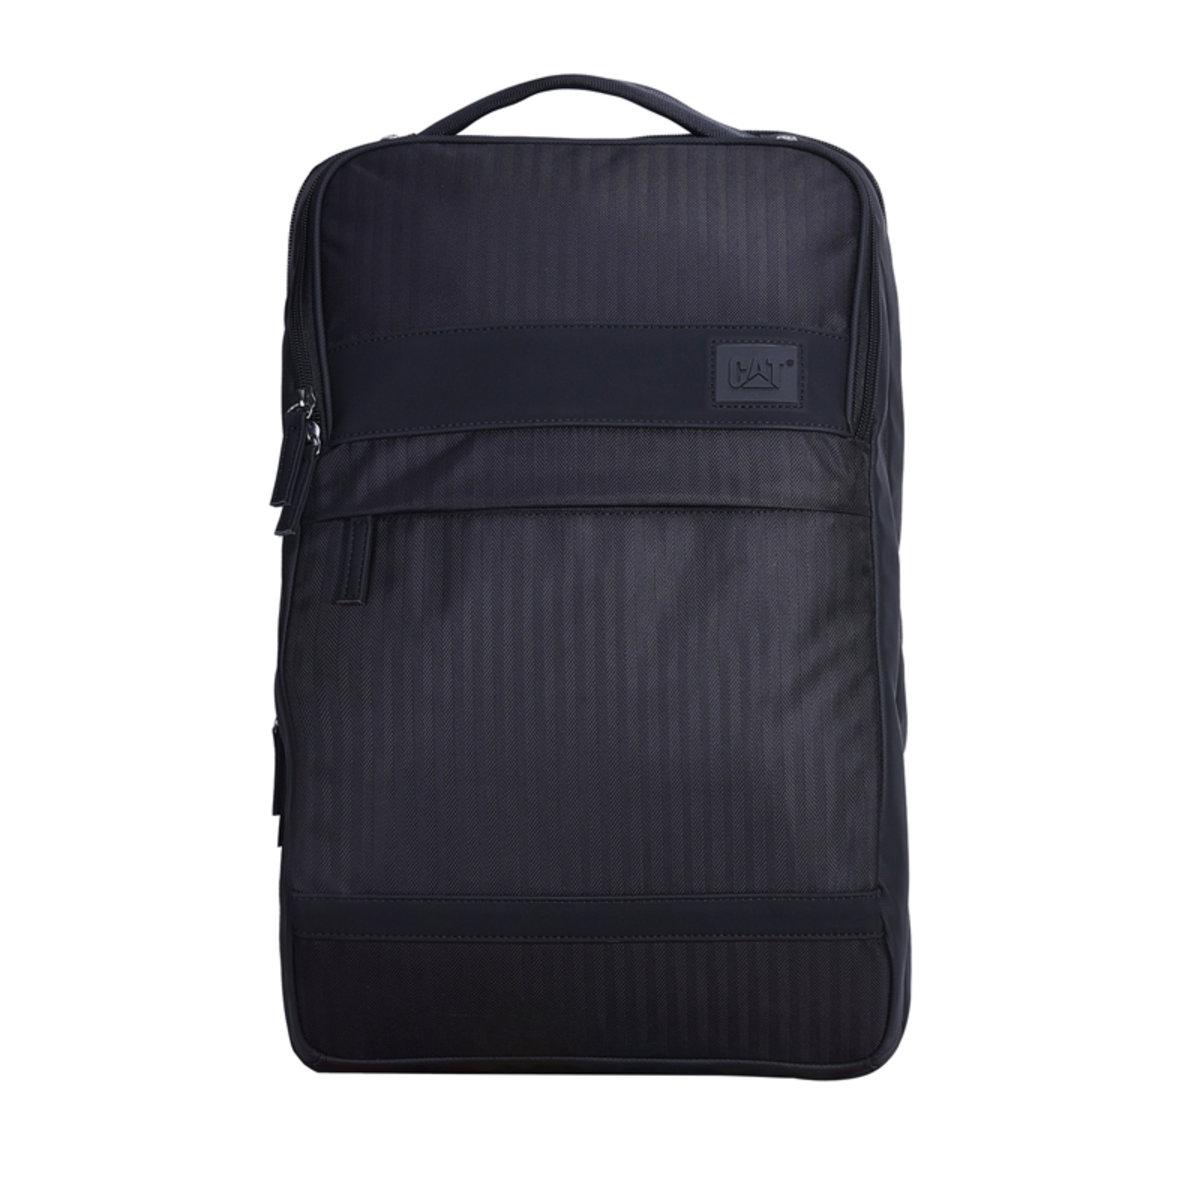 NEW ERA BACKPACK (Medium) BLACK|背包 背囊 旅遊外出必備